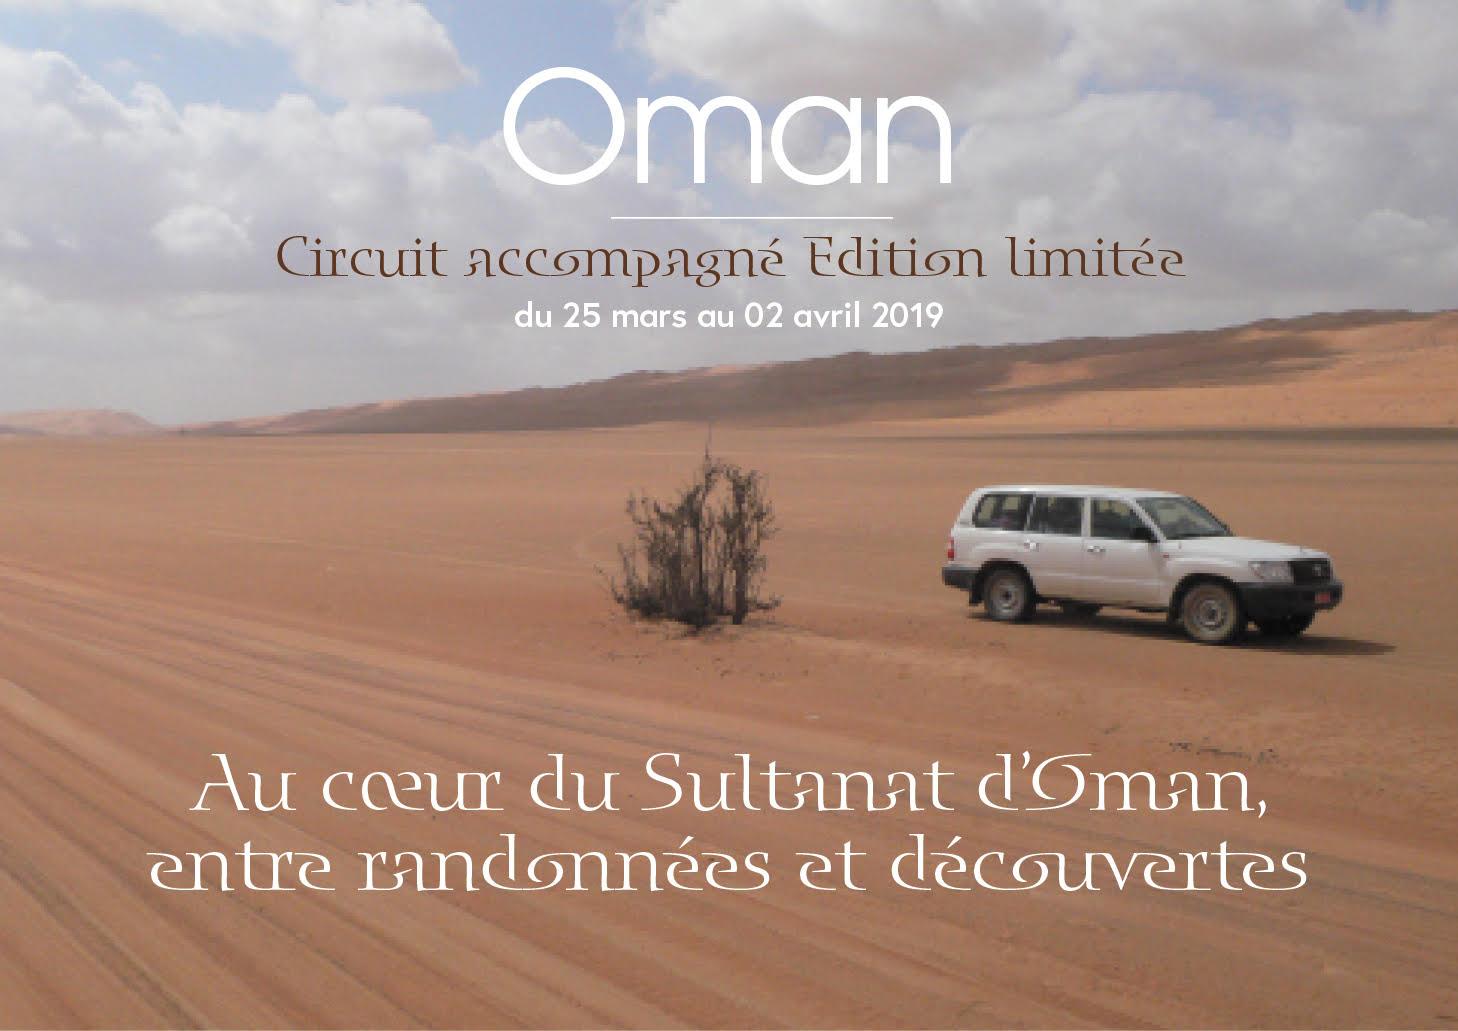 Oman, circuit accompagné Edition limitée